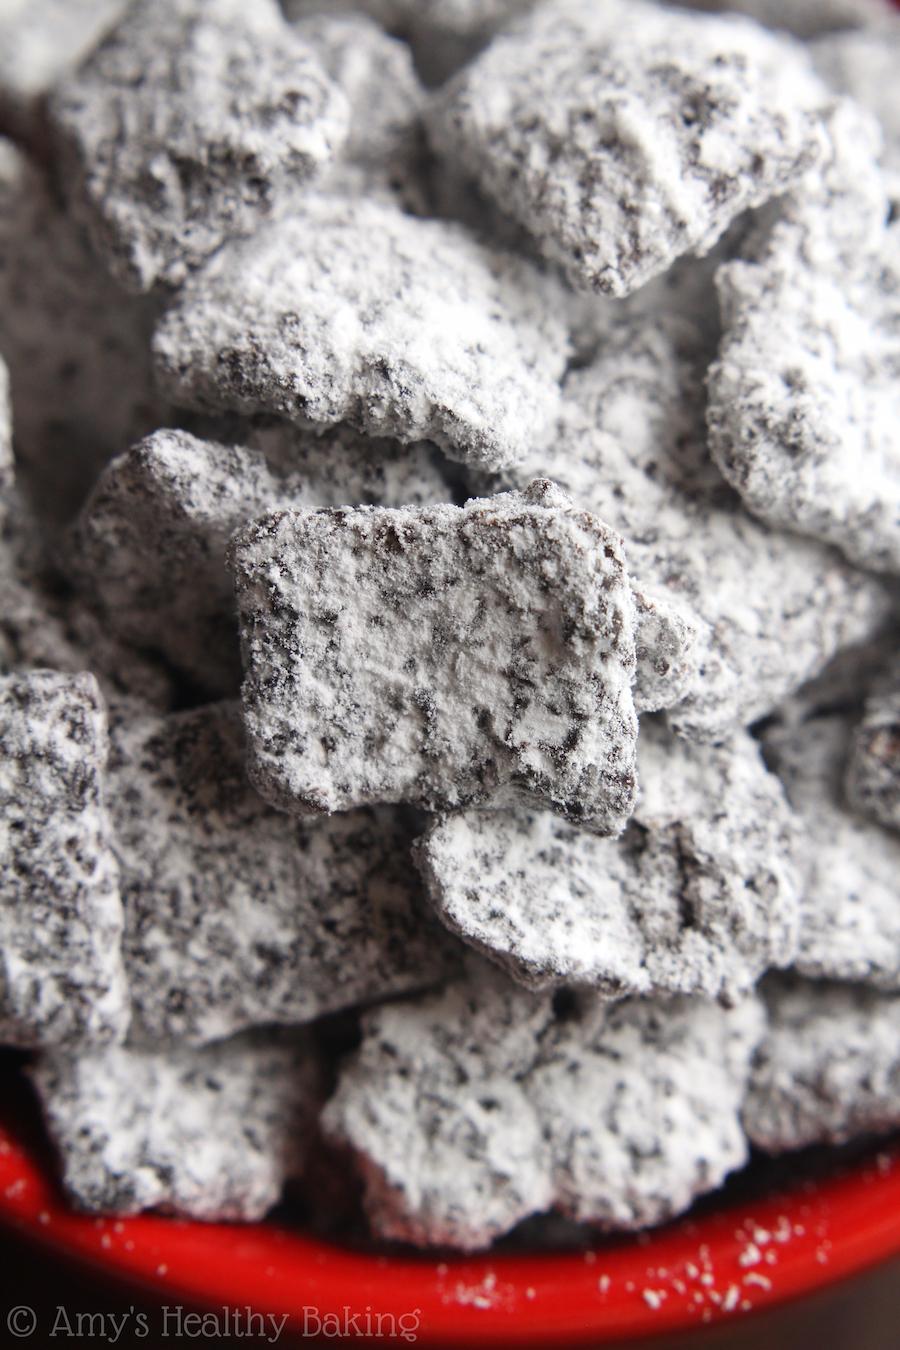 Skinny Mocha Muddy Buddies -- sweet, crunchy & with 50% FEWER calories than the original recipe!